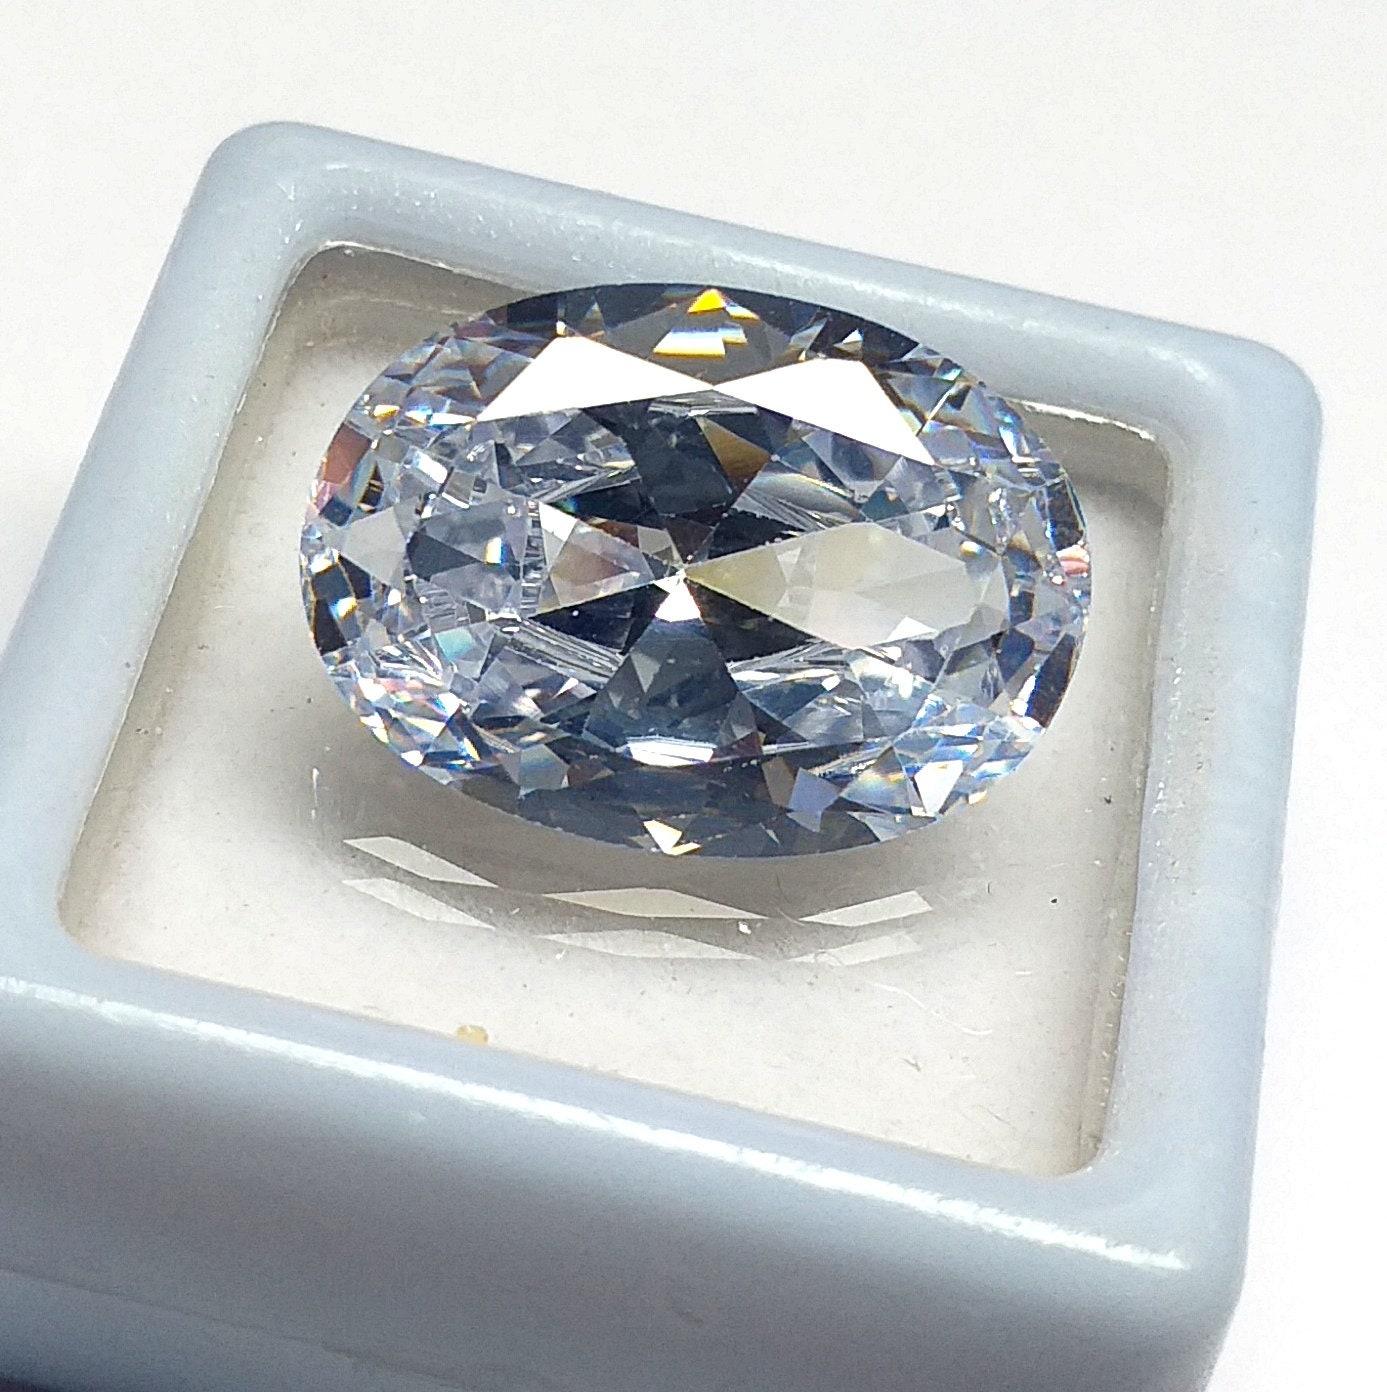 Details about  /20.00 Ct Natural Stunning Fine Diamond Cut Pink Zircon Loose Gemstone Gem Lot